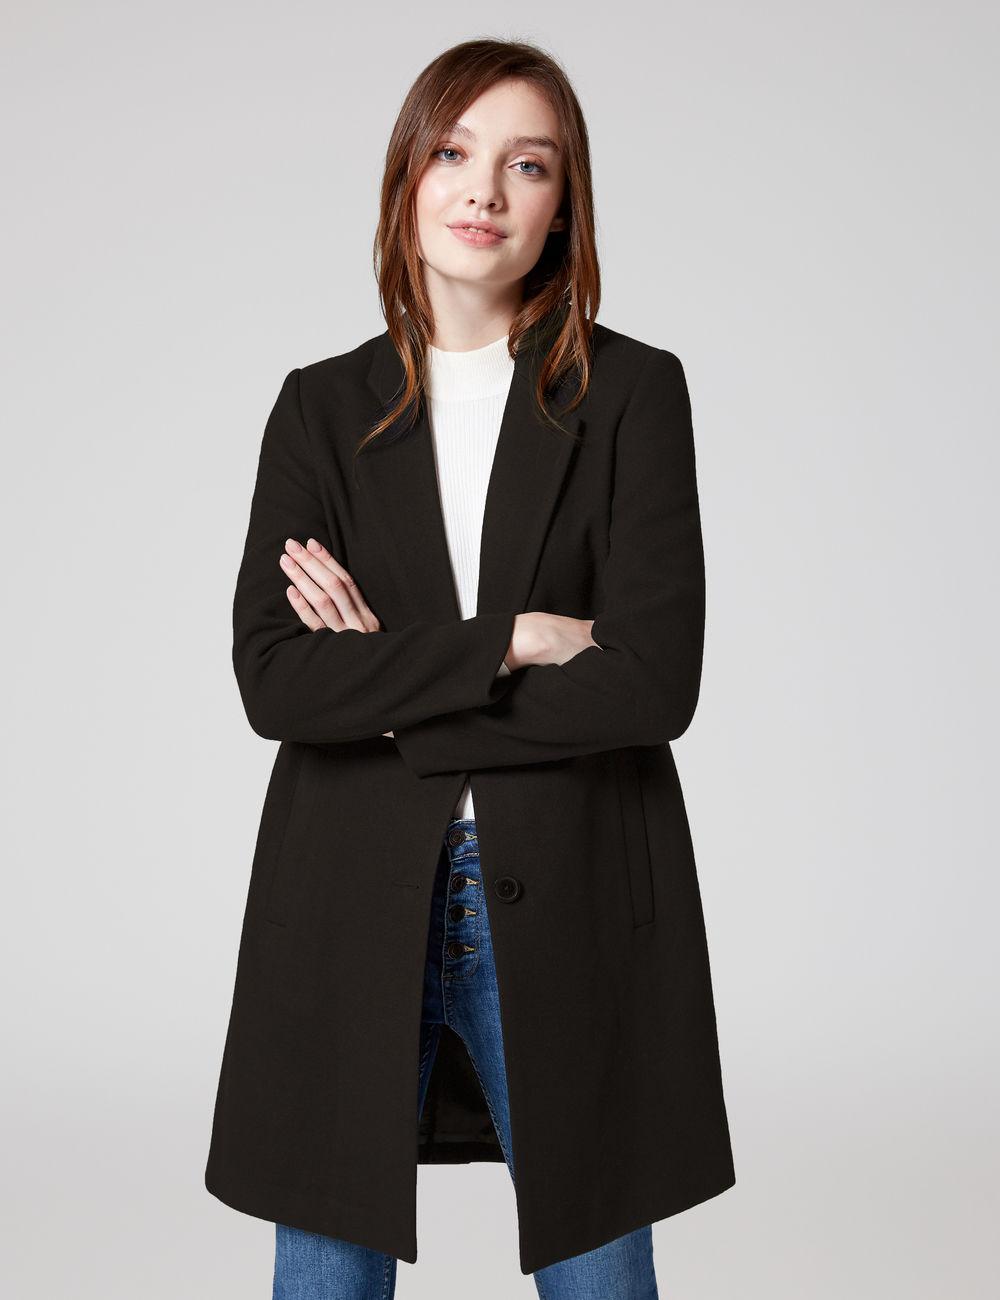 manteau caban noir Jennyfer prix 45,99 €